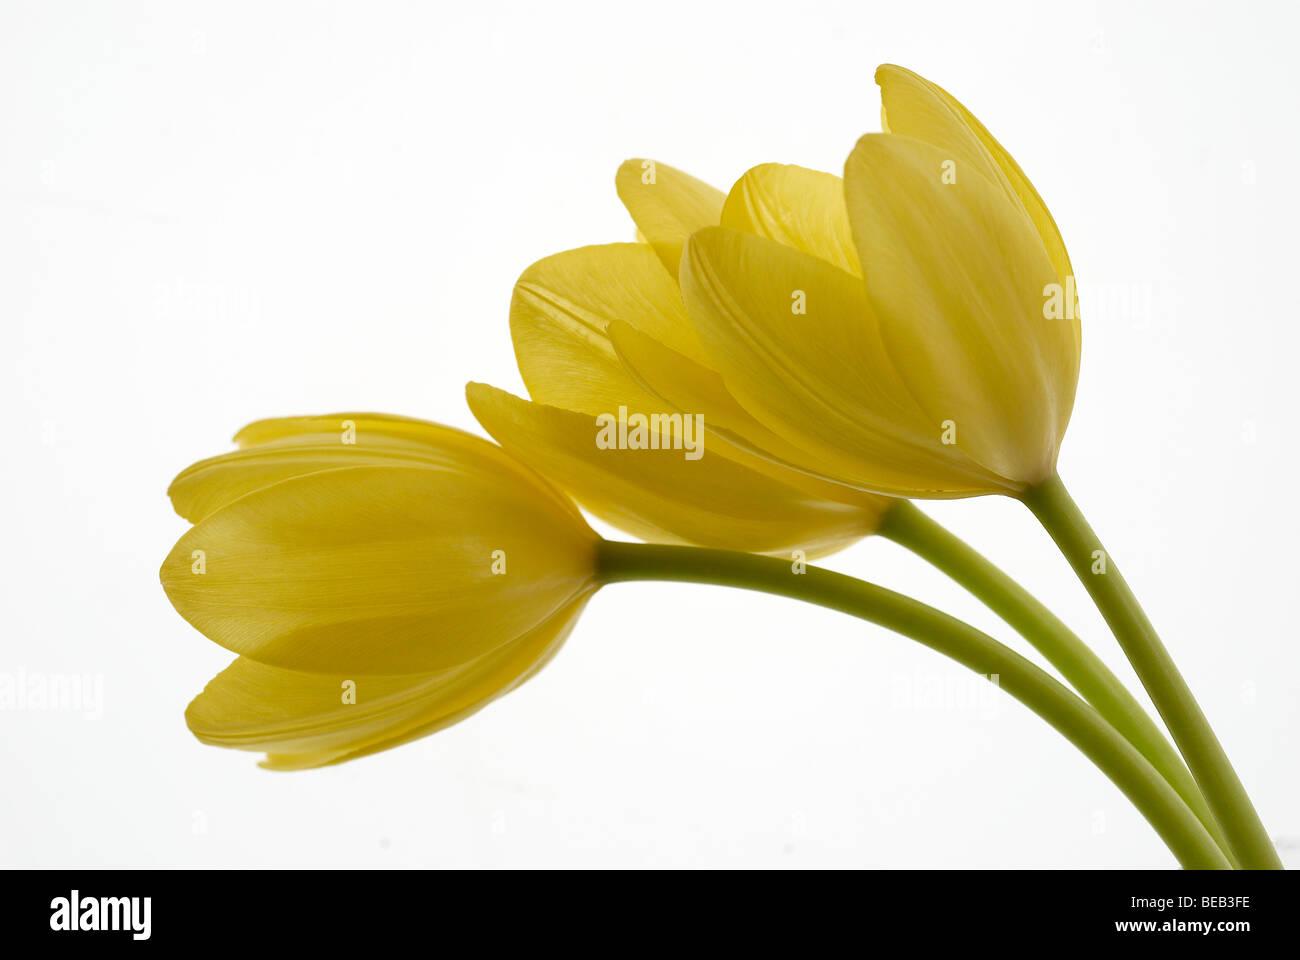 Tulip yellow tulip white background flowers flower 3 tulips tulip yellow tulip white background flowers flower 3 tulips stems close up close up macro profile summer yellow mightylinksfo